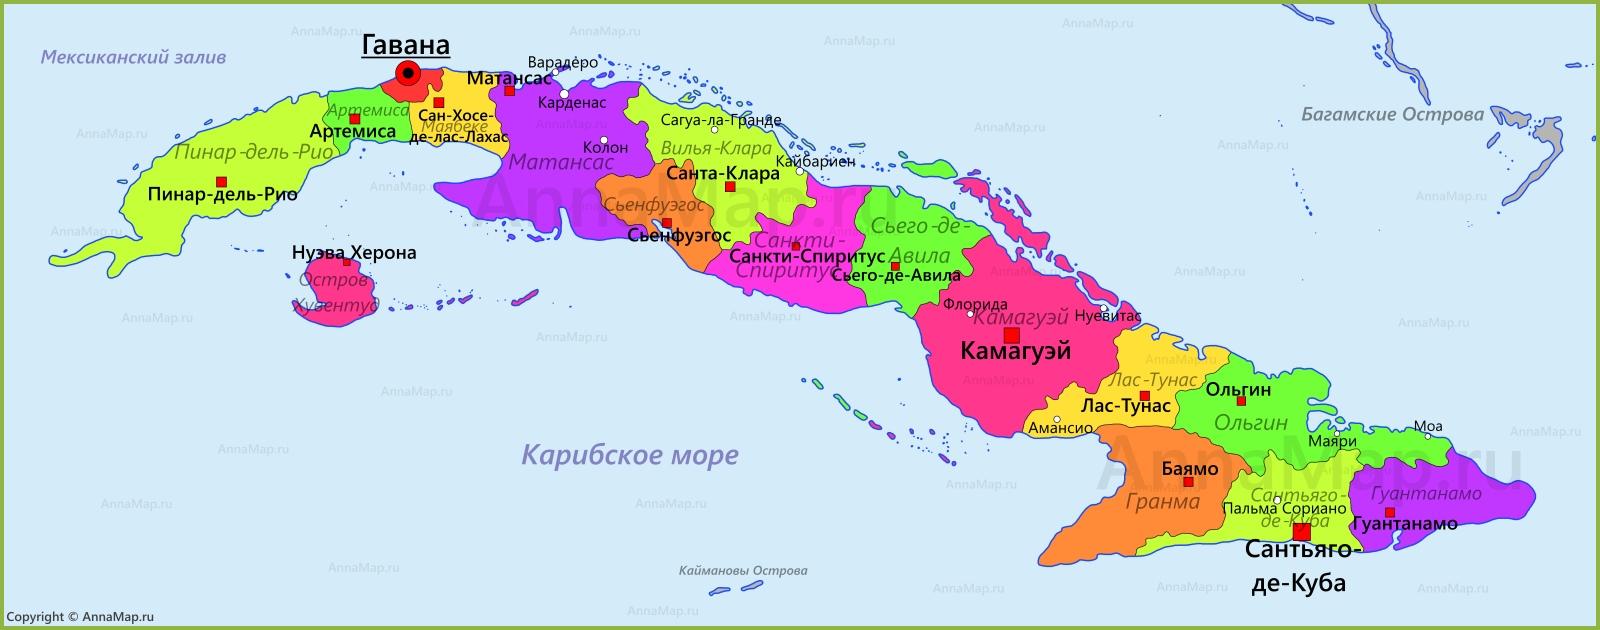 Karta Kuby Na Russkom Yazyke S Gorodami I Kurortami Annamap Ru